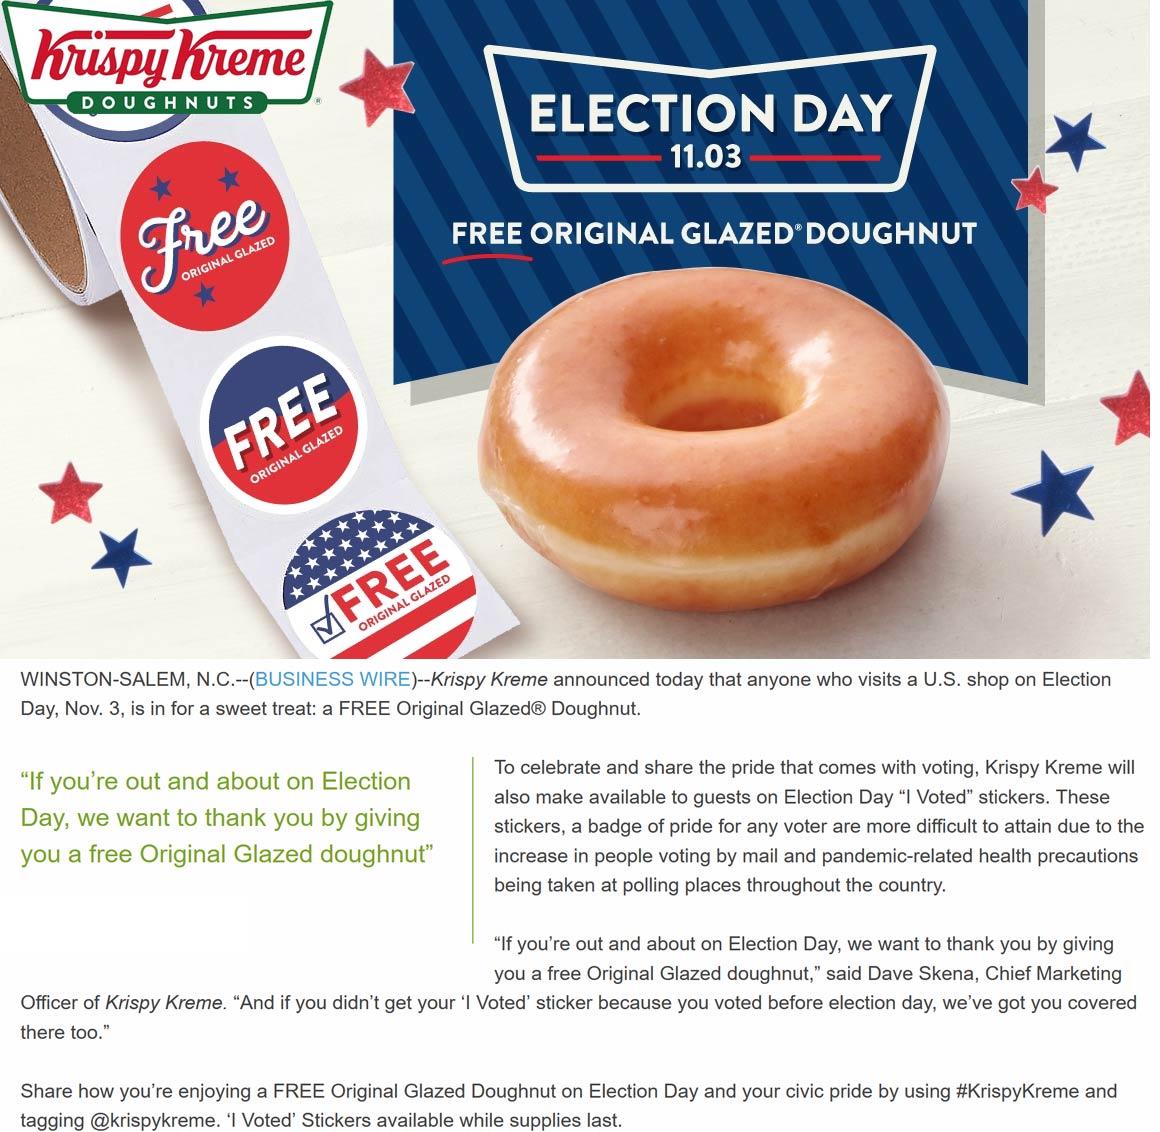 Krispy Kreme restaurants Coupon  Free glazed doughnut Tuesday with your I Voted sticker at Krispy Kreme #krispykreme